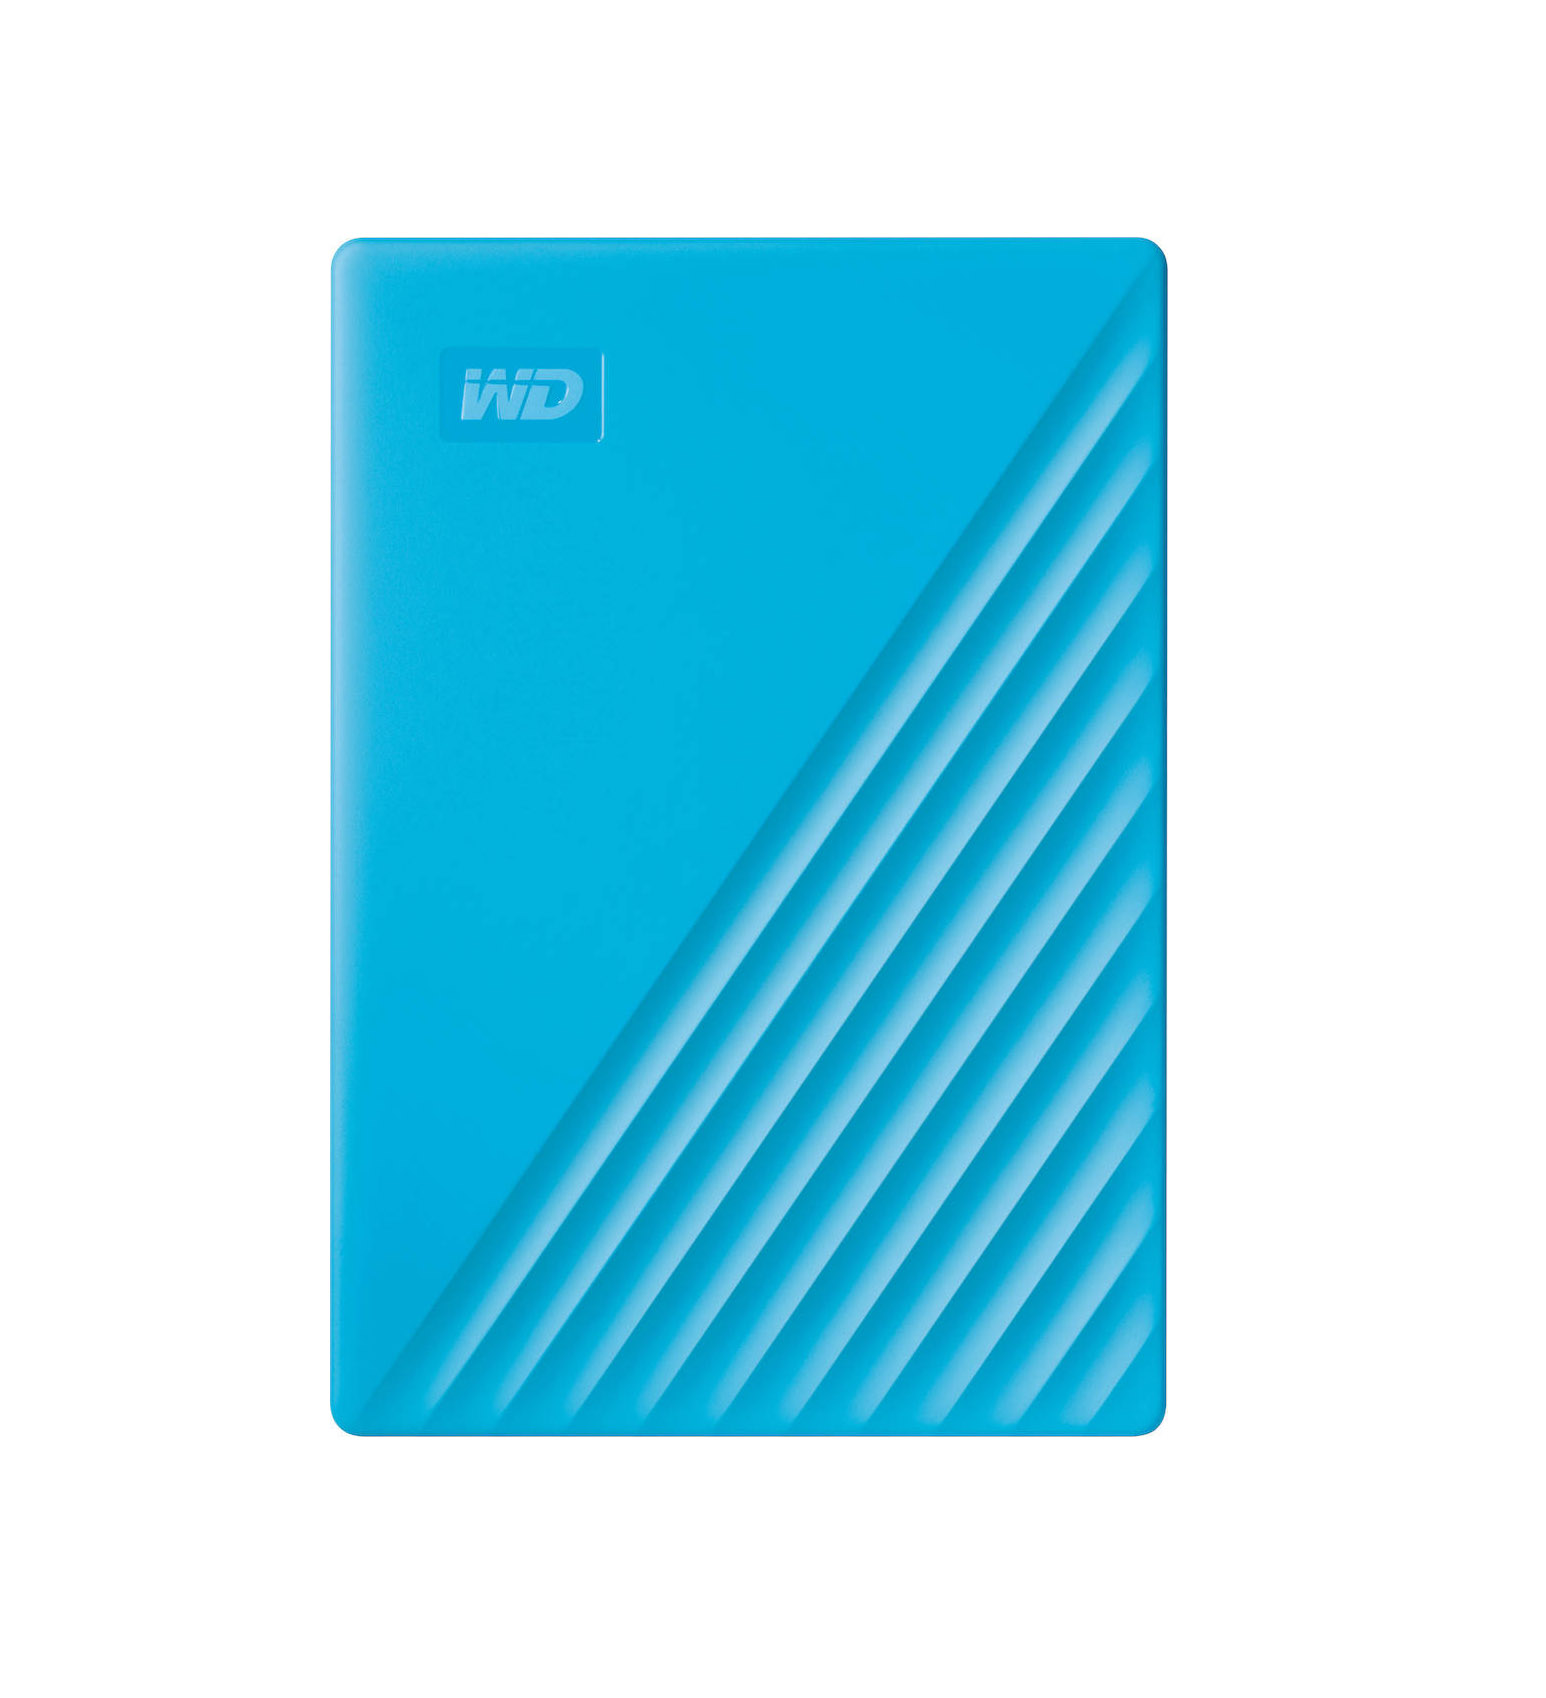 Western Digital My Passport 4TB 2019 WDBPKJ0040BBL-WESN Εξωτερικός Σκληρός Δίσκος* USB 3.0 Sky